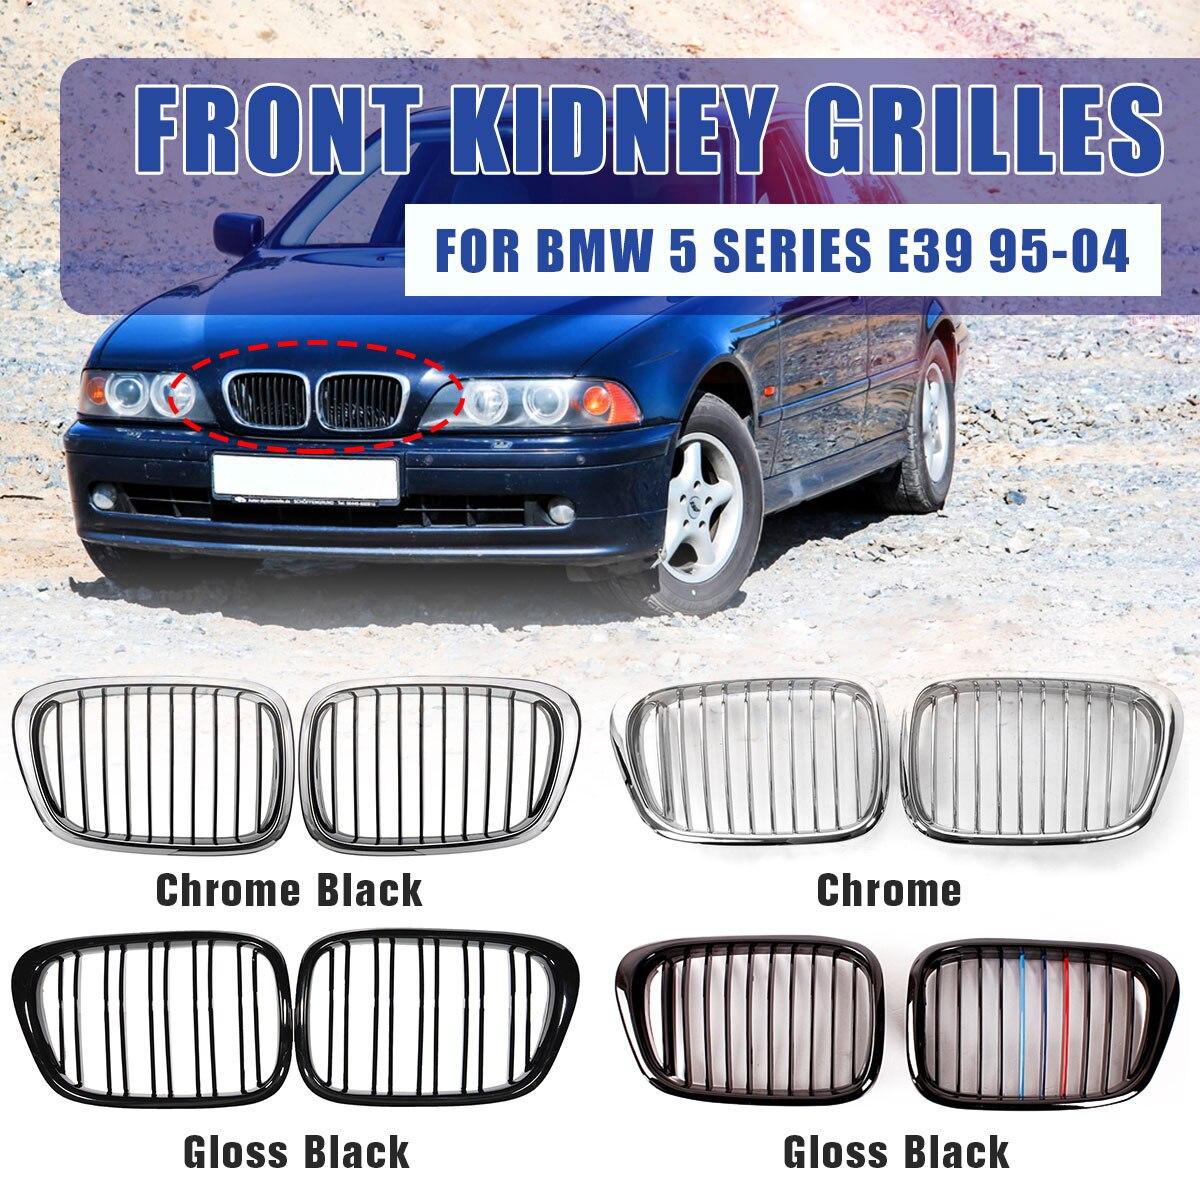 2 uds frente del coche brillo M-color riñón rejilla rejillas para BMW E39 5 Series 525, 528, 530, 540 M5 1997, 1998, 1999, 2000, 2001, 2002, 2003